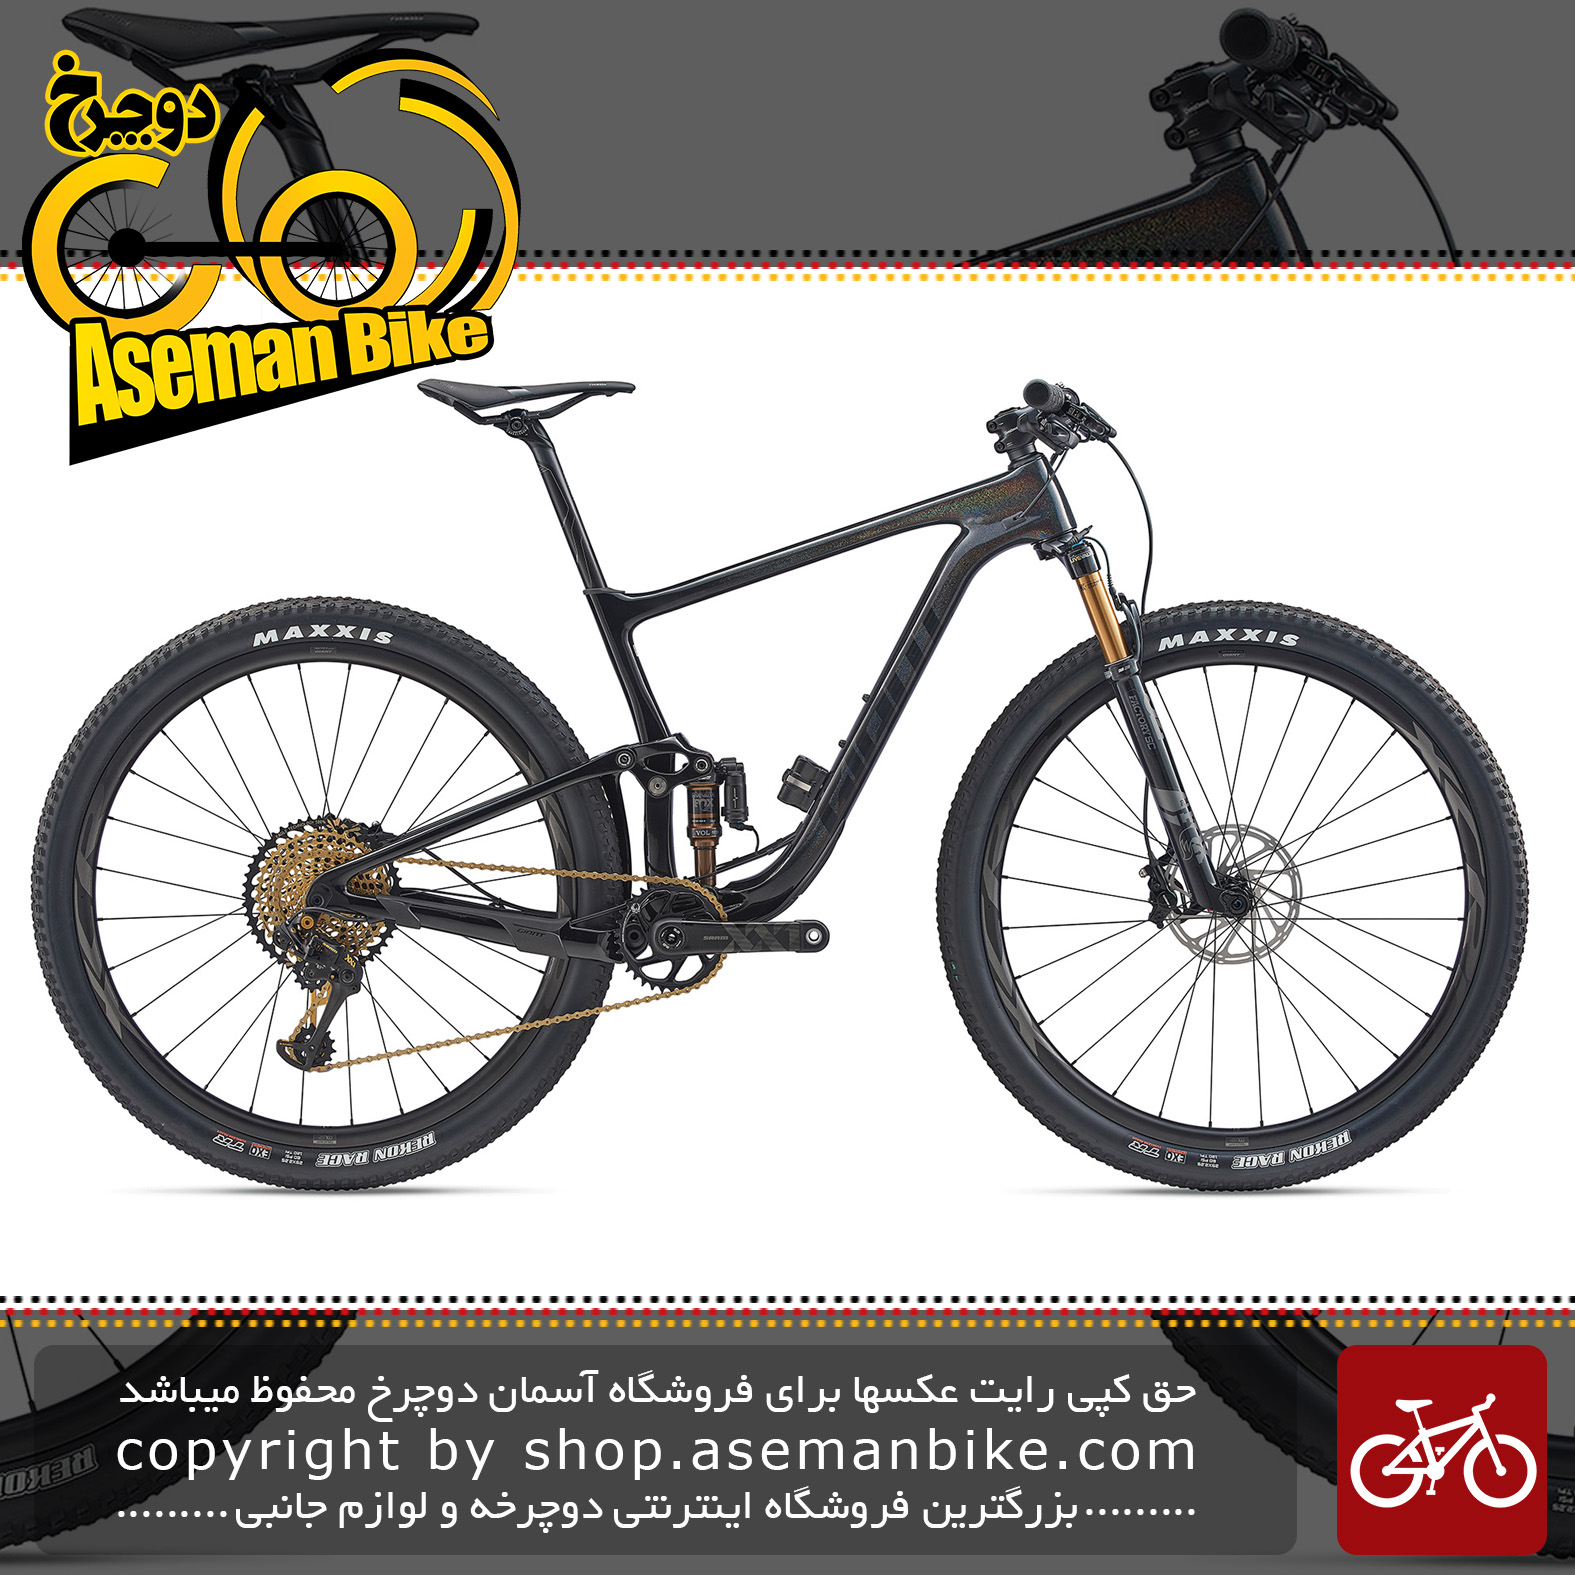 دوچرخه کوهستان جاینت مدل انتم ادونس پرو 29 اینچ 0 ایگل Giant Mountain Bicycle Anthem Advanced Pro 29 0 Eagle